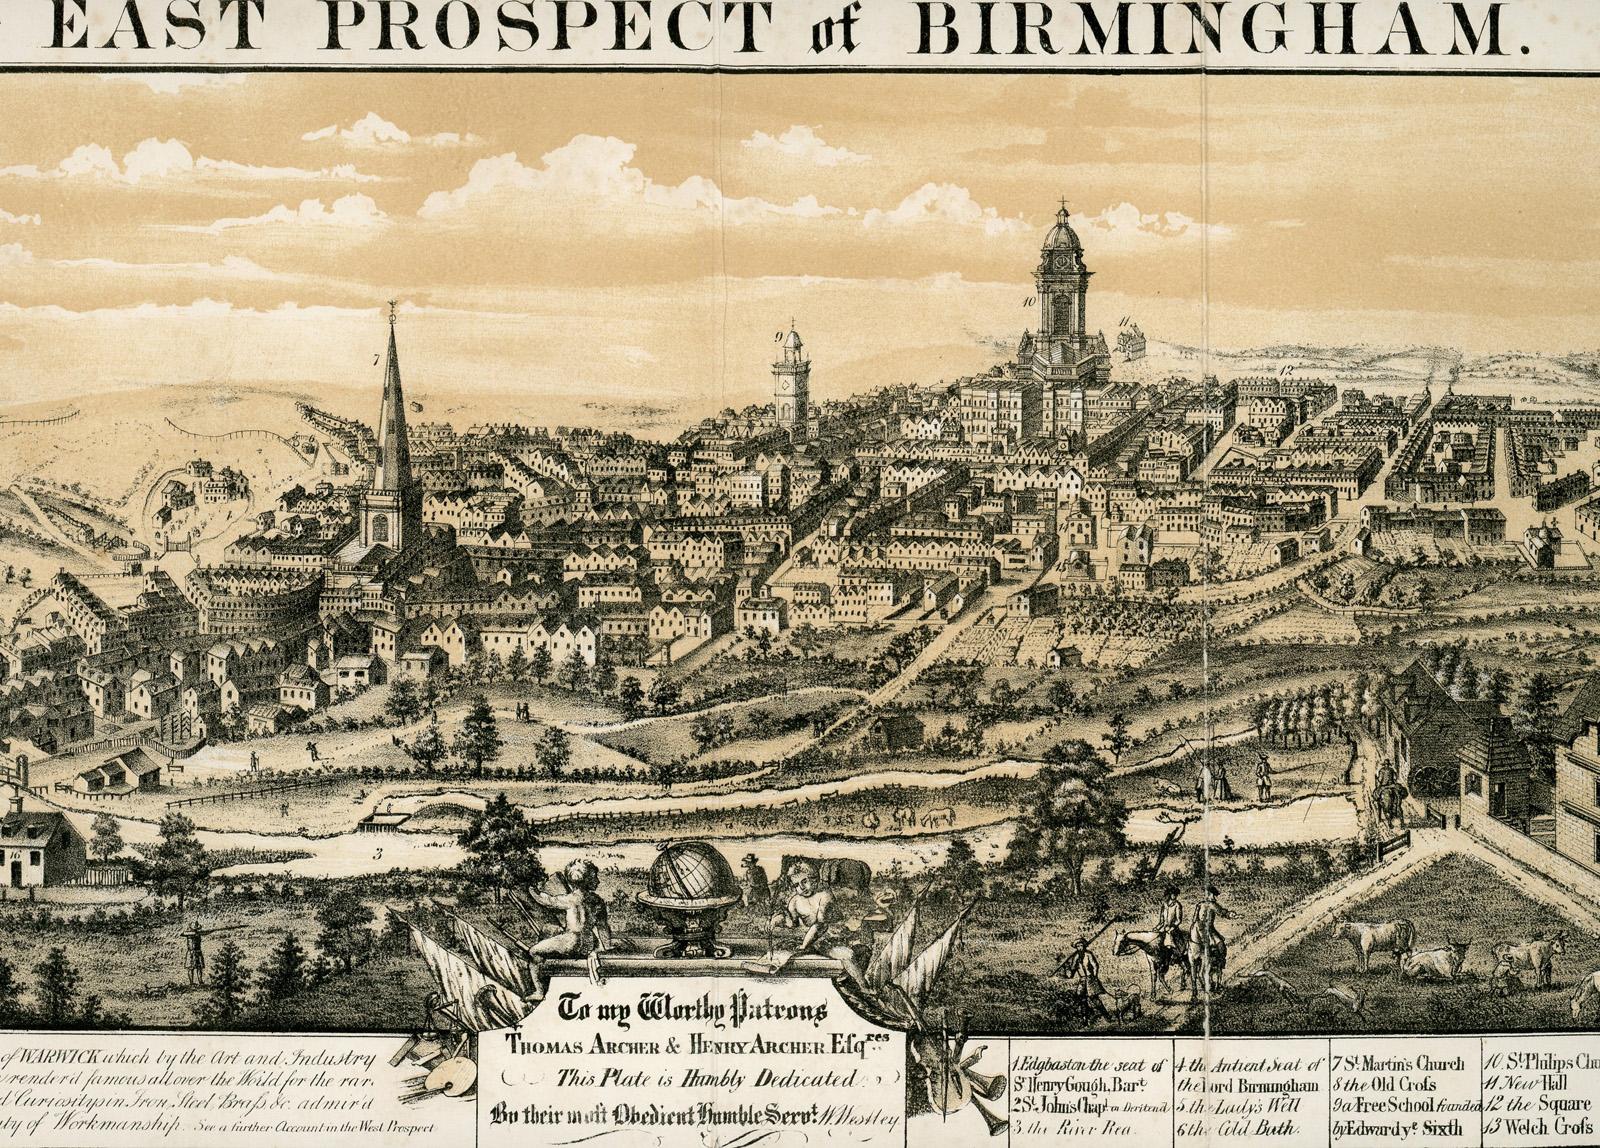 The East Prospect of Birmingham